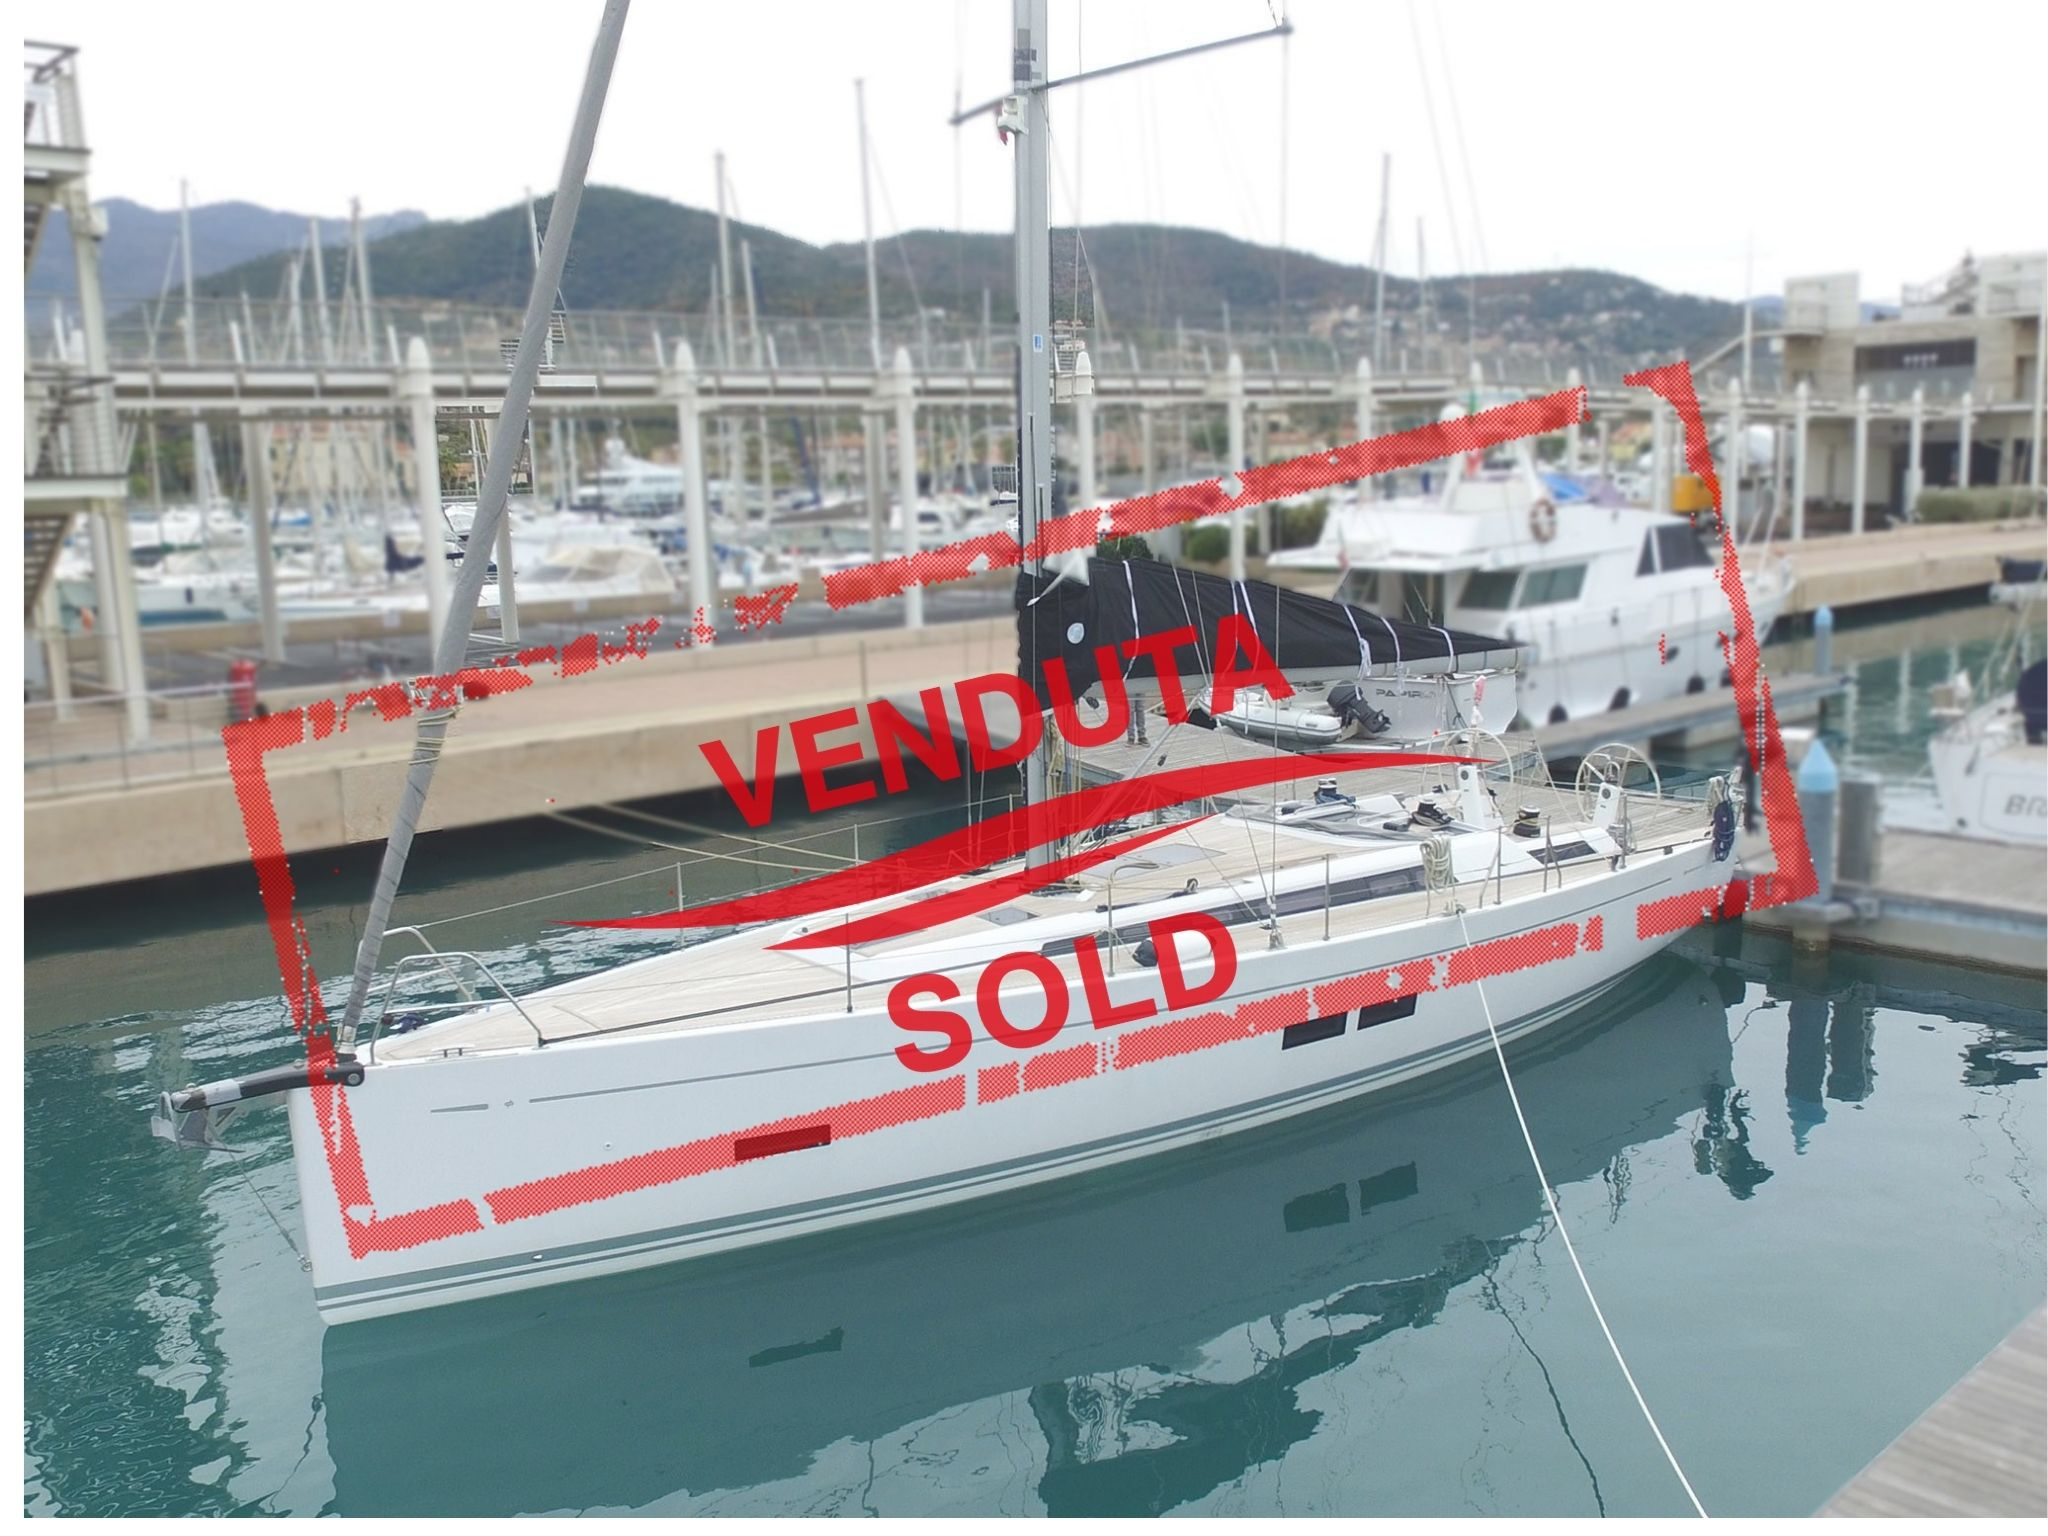 Grand Soleil 43 Maletto 2013 venduto